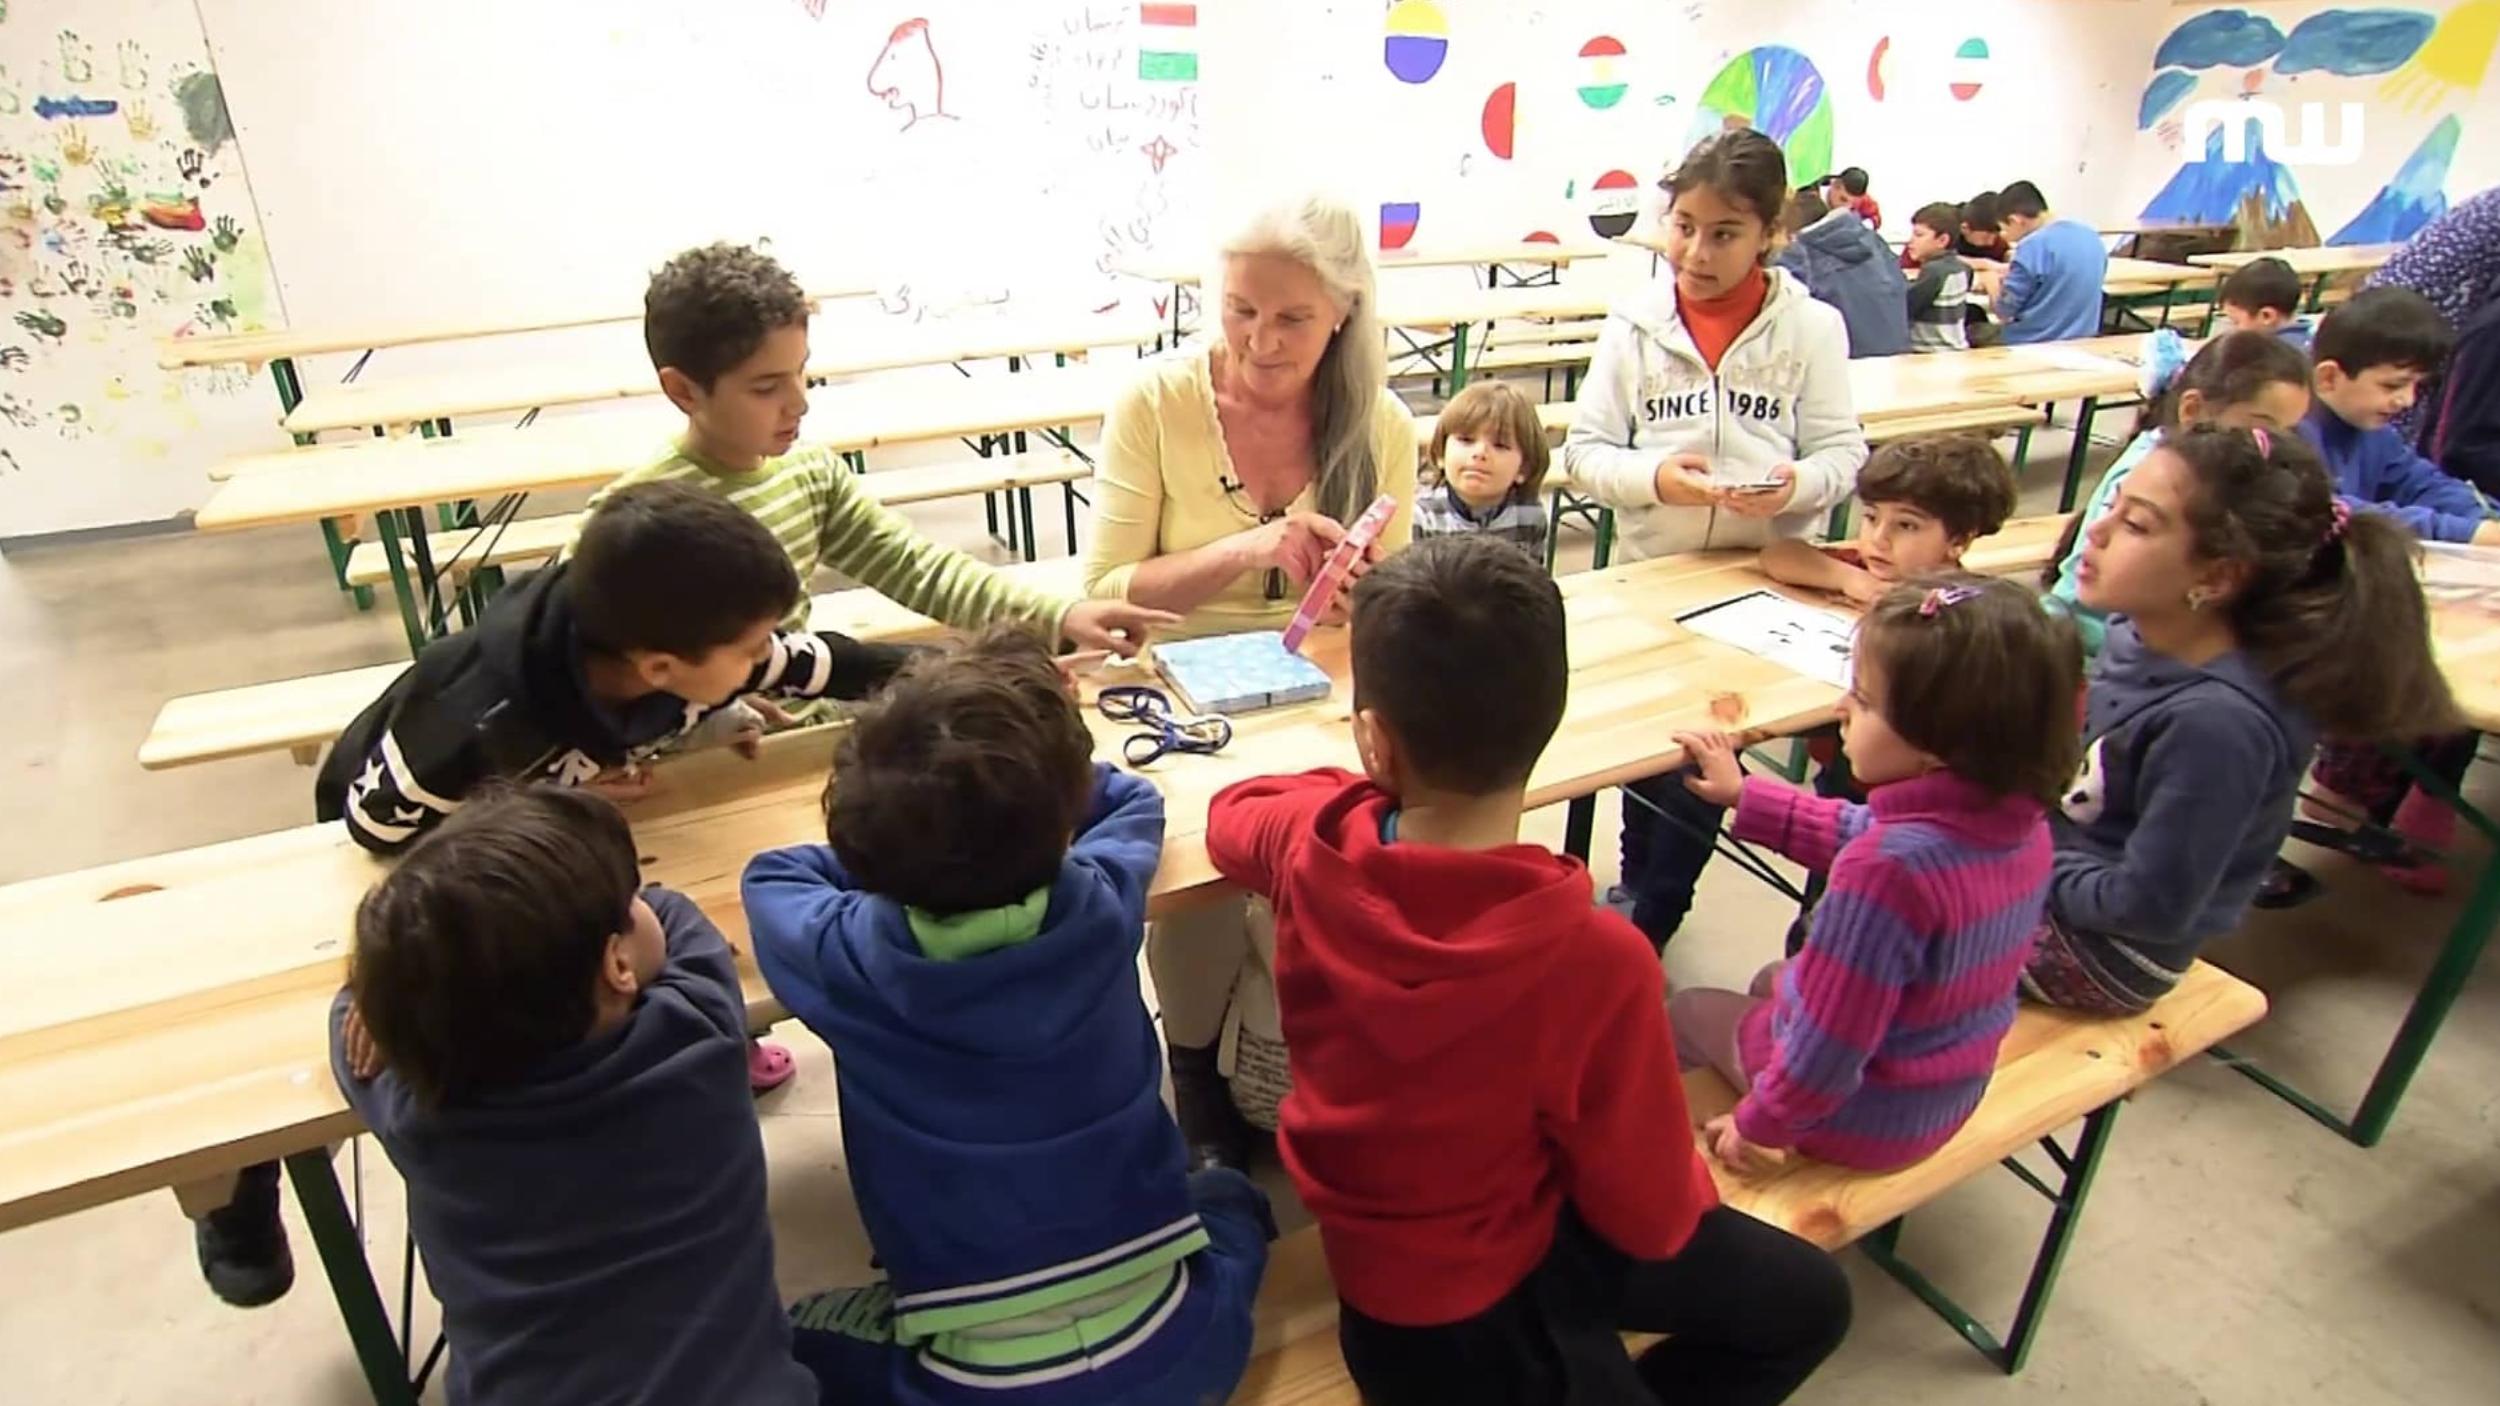 Ehrenamtliche in der Flüchtlingshilfe